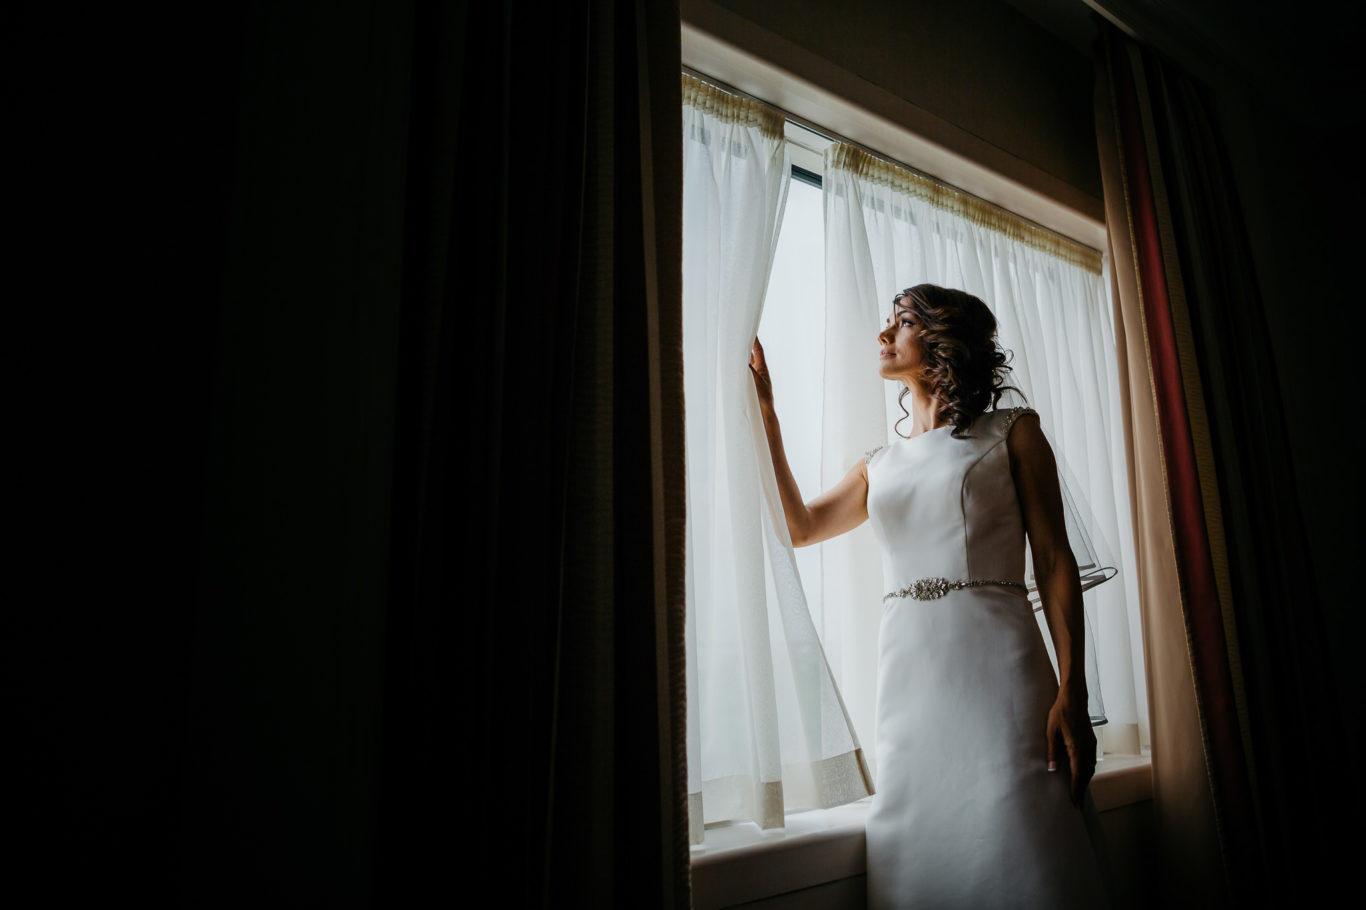 0236-fotografie-nunta-bucuresti-dana-radu-fotograf-ciprian-dumitrescu-dc1_3826